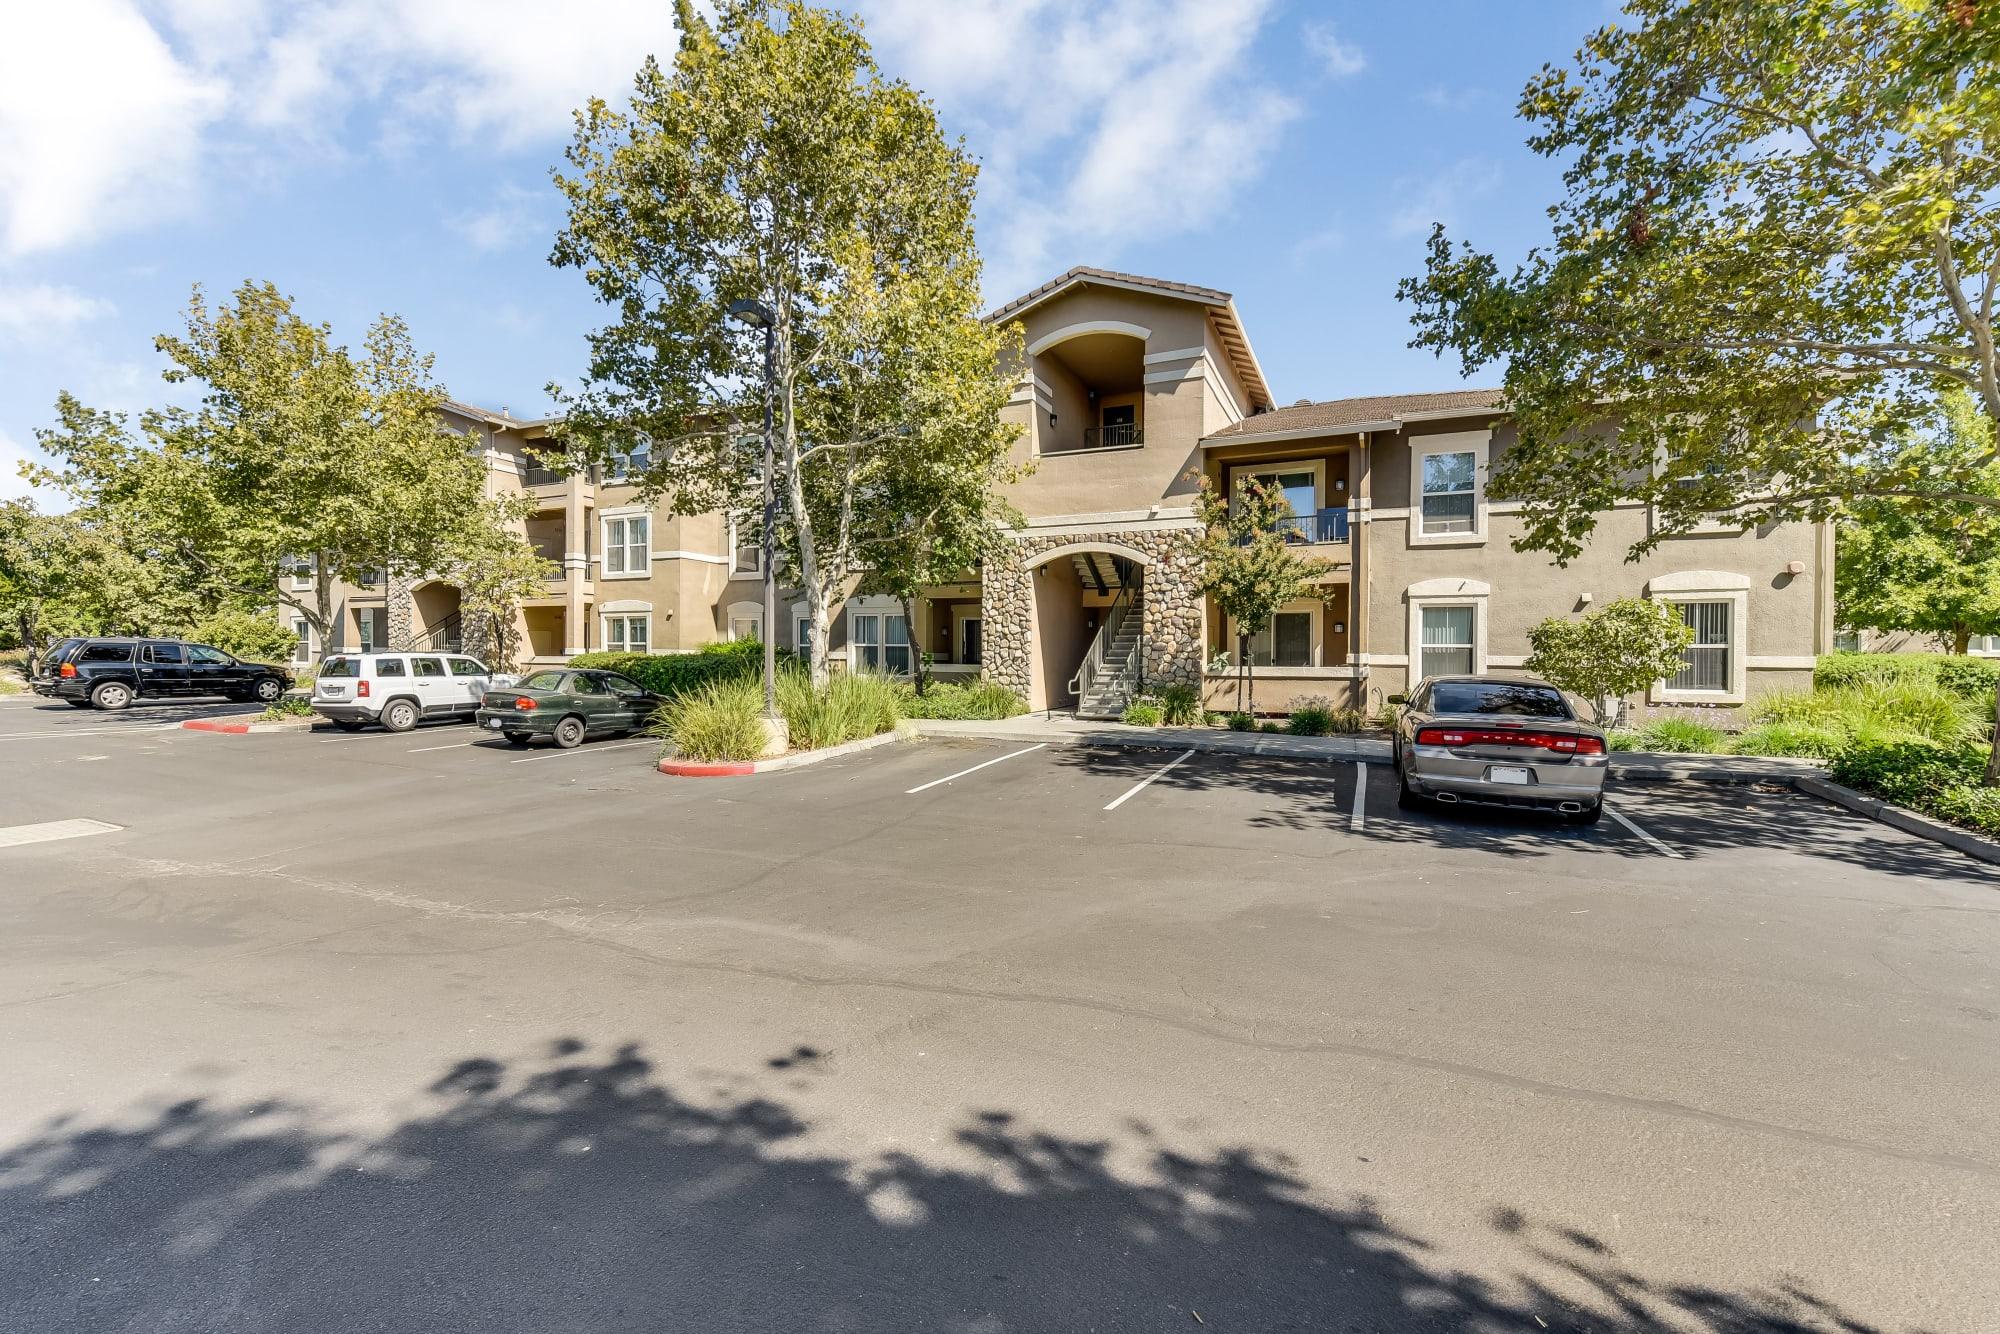 The front of the Natomas Park Apartments building in Sacramento, California